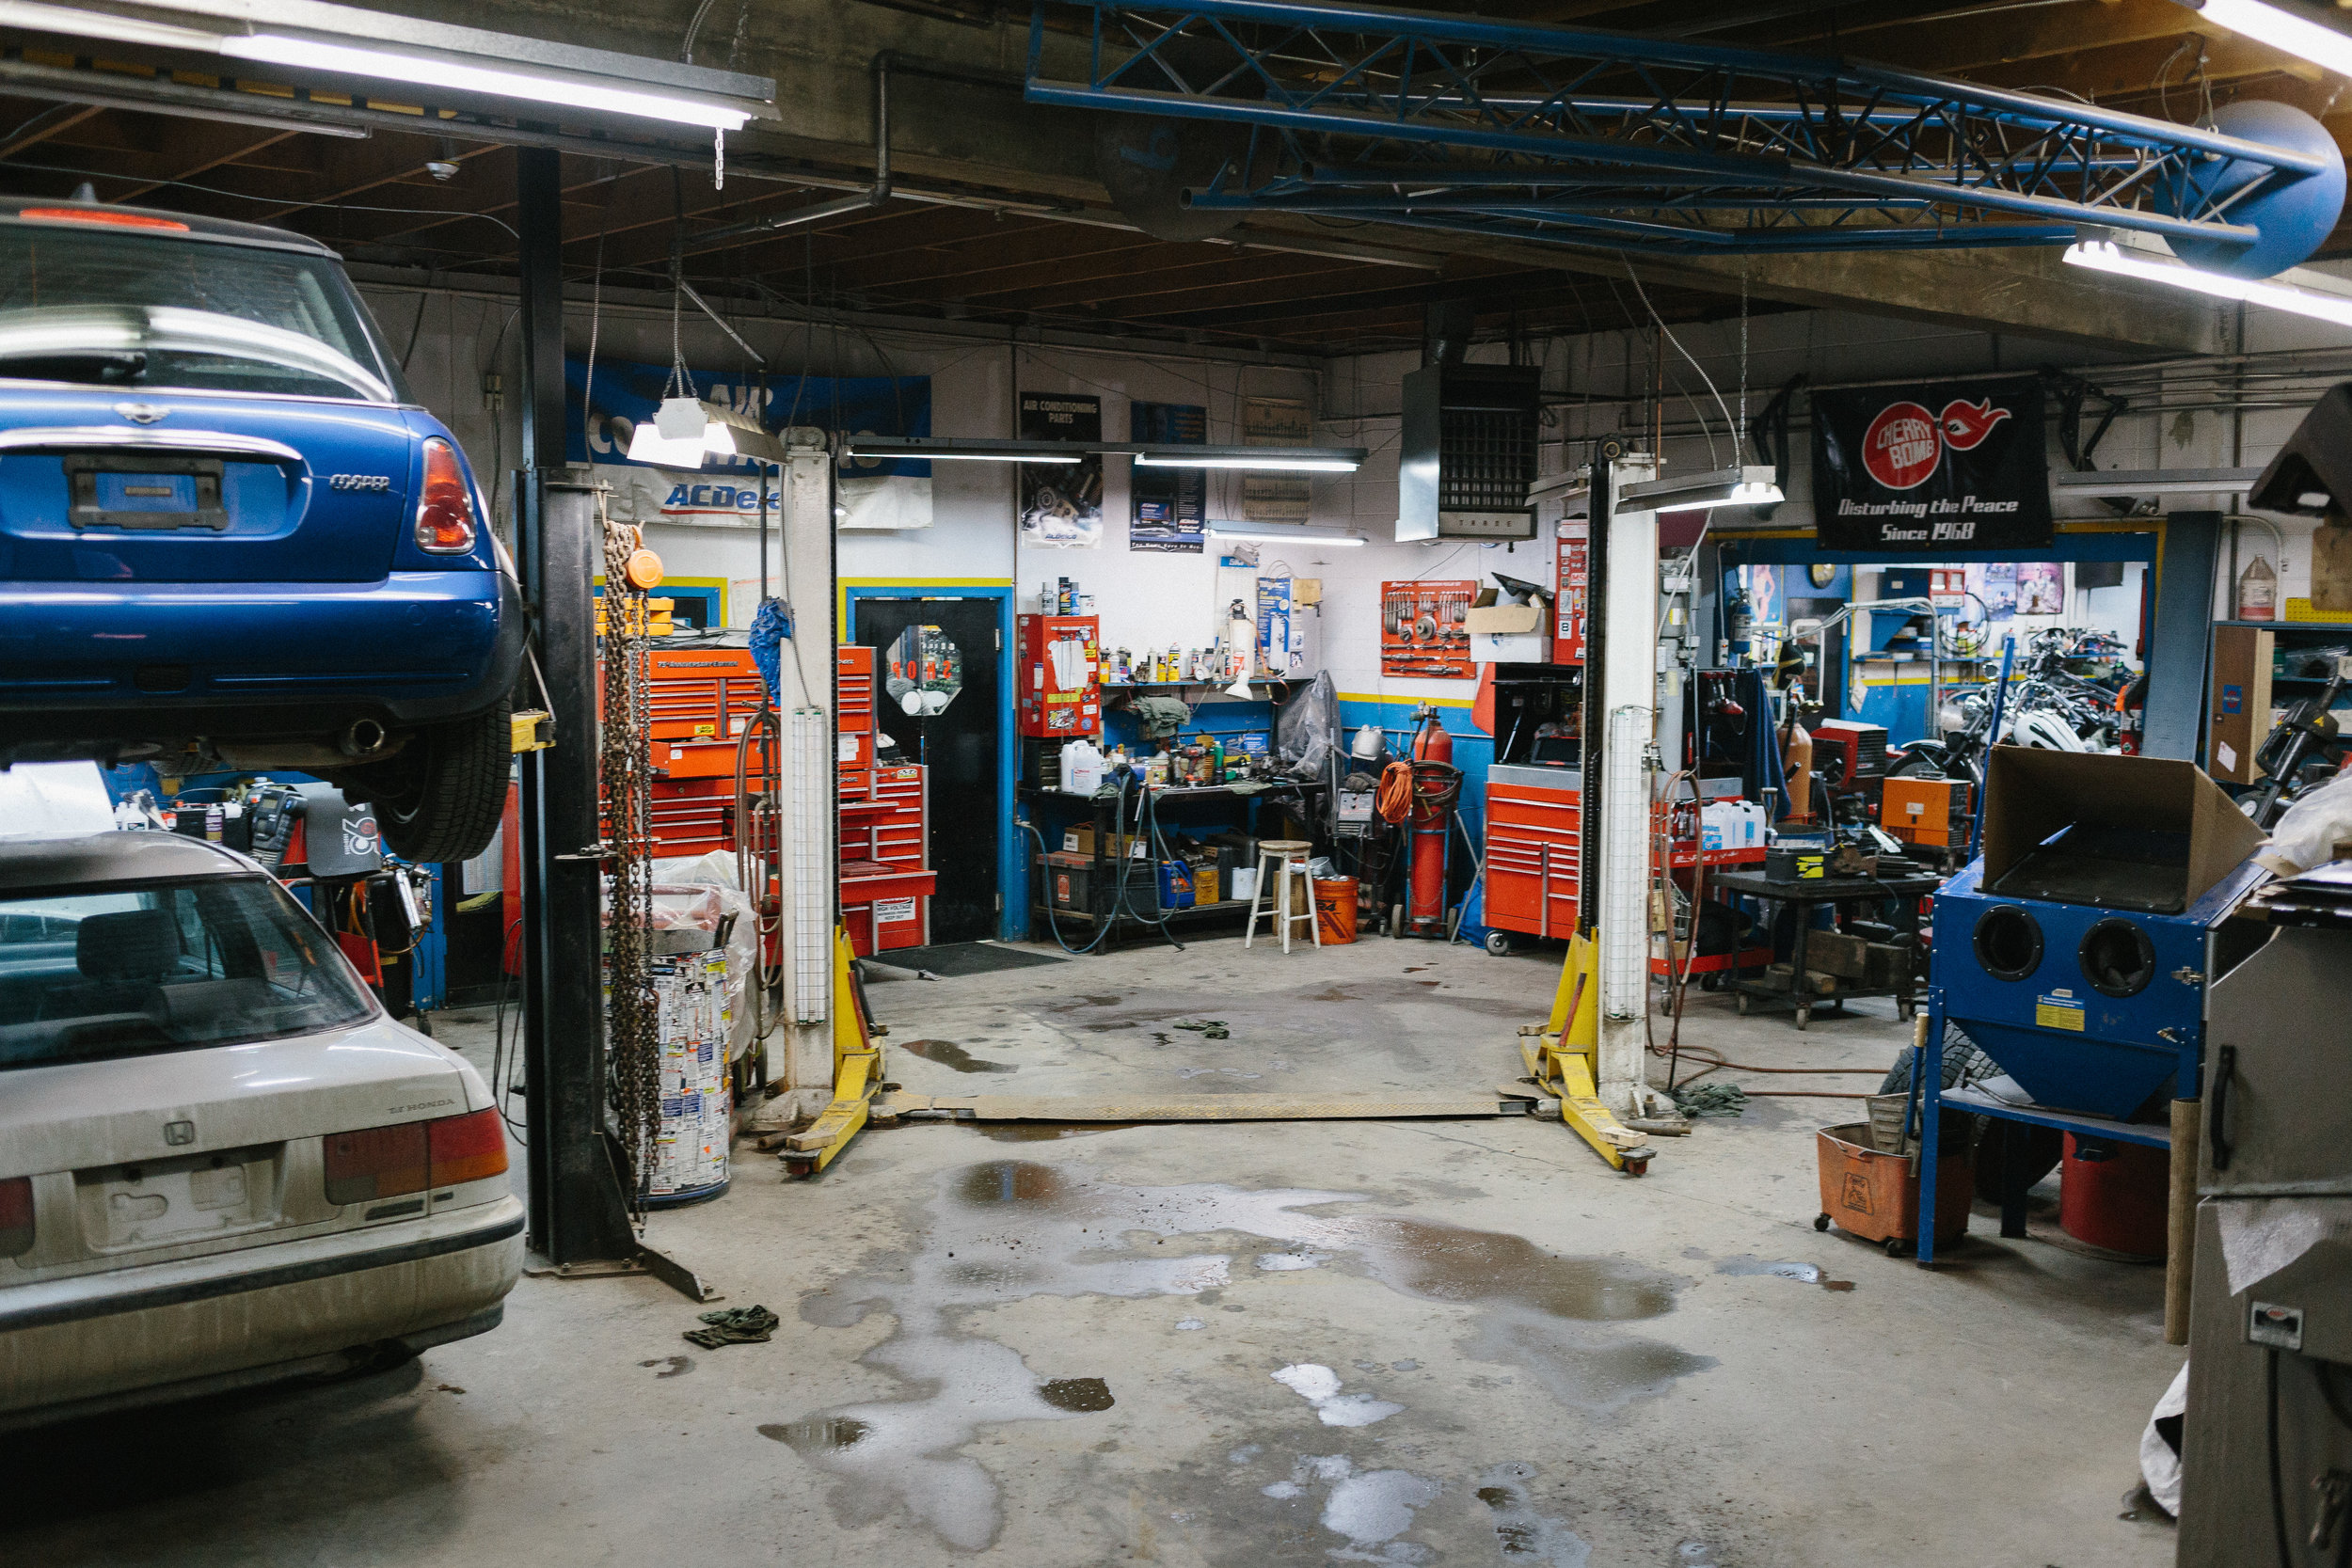 performance-cycle-and-auto-calgary-autobody-mechanic-shop-yyc-62.jpg